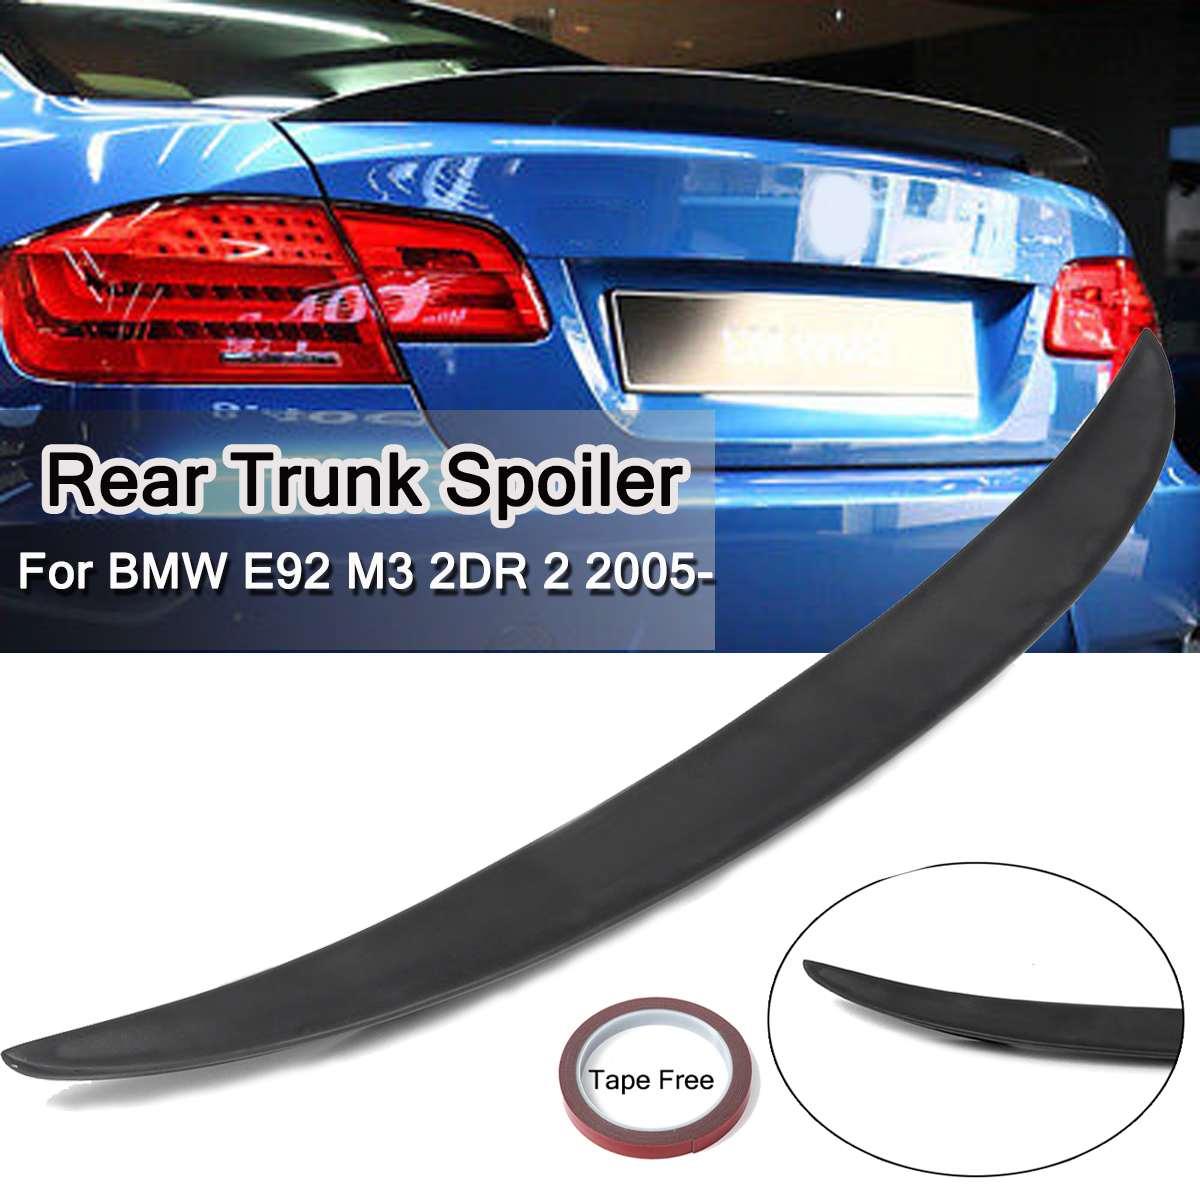 ABS Car Rear Trunk Spoiler Lip Wing Wings Guard Matte Black 9-T-0256 For BMW E92 M3 2DR 2 2005 -